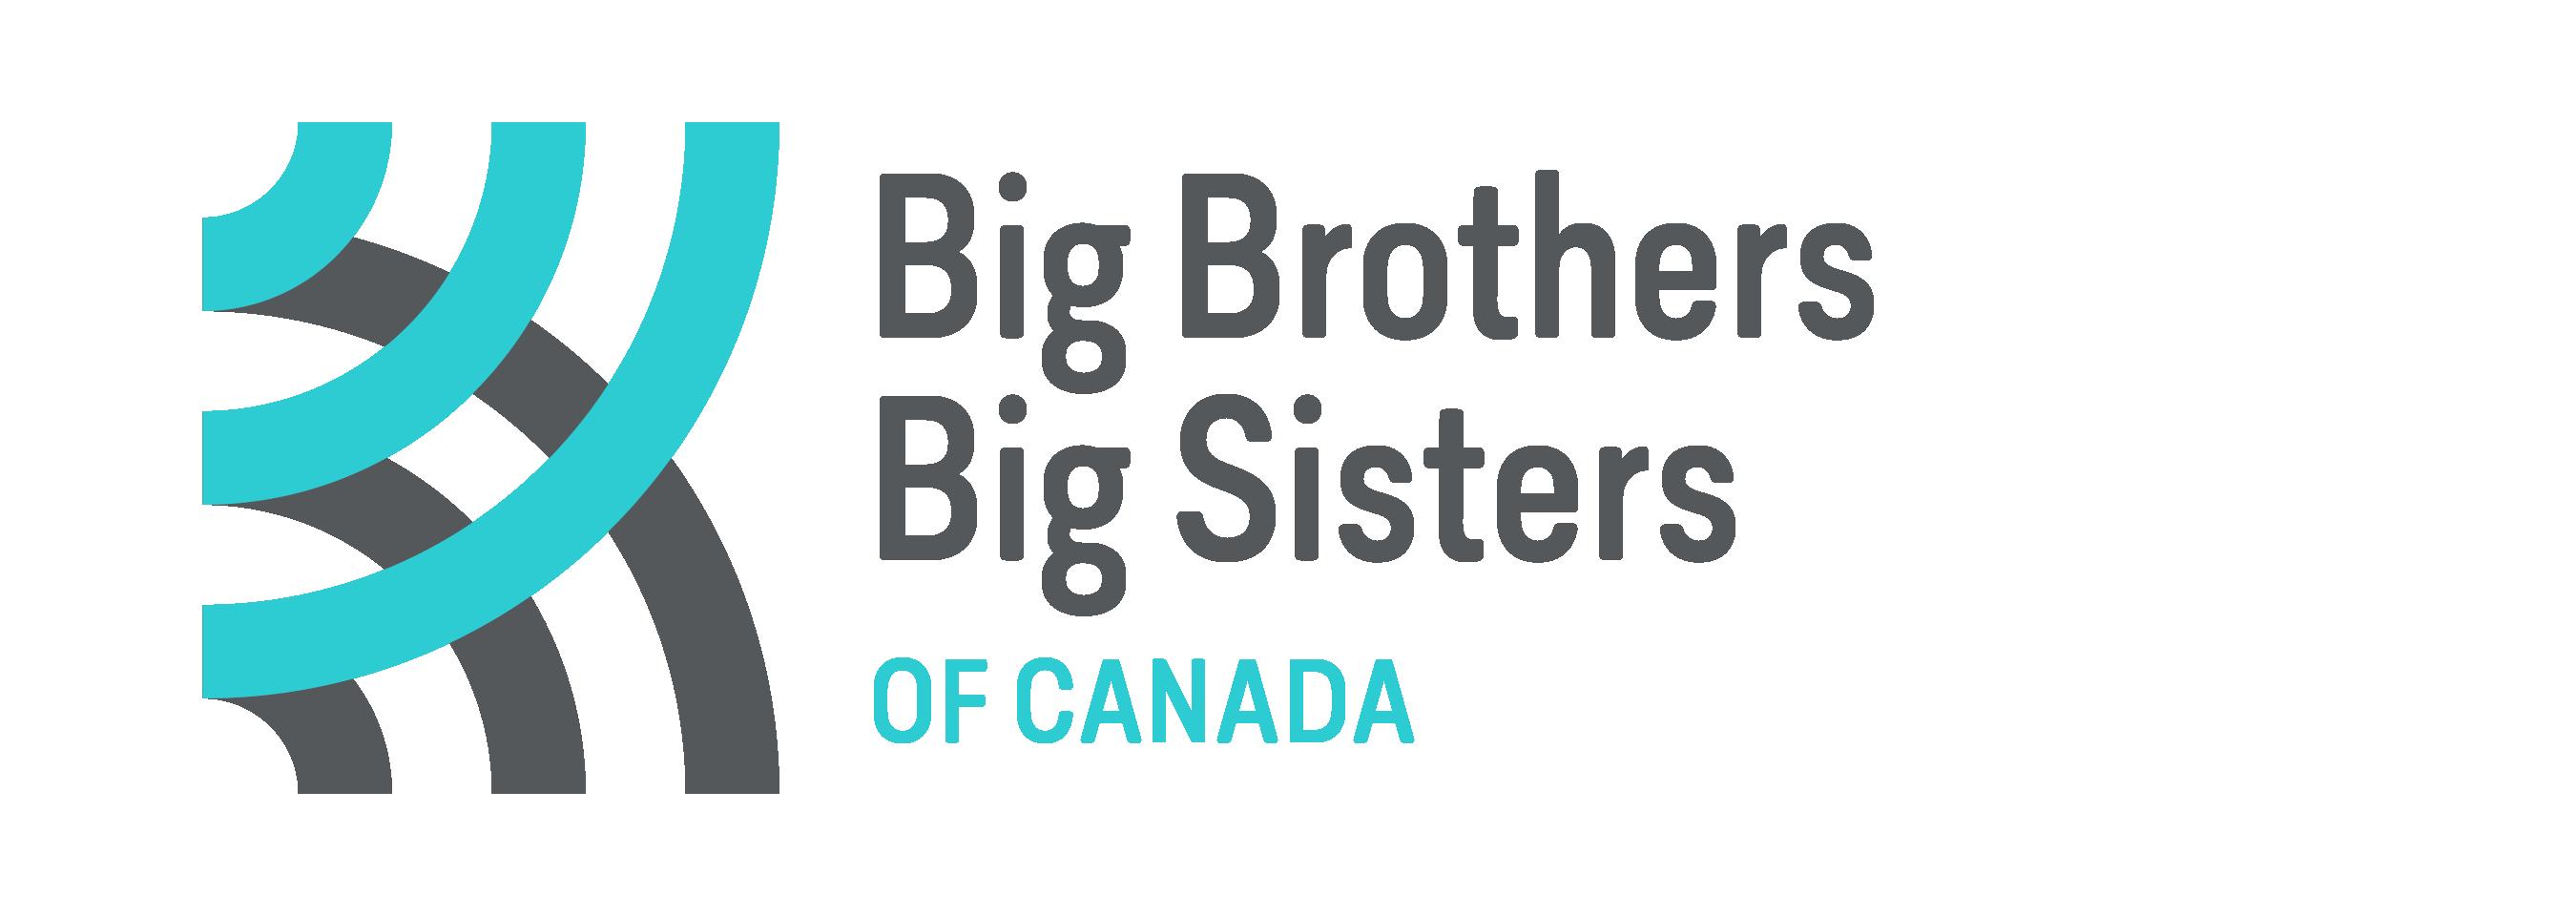 Big Brothers Big Sisters of Canada